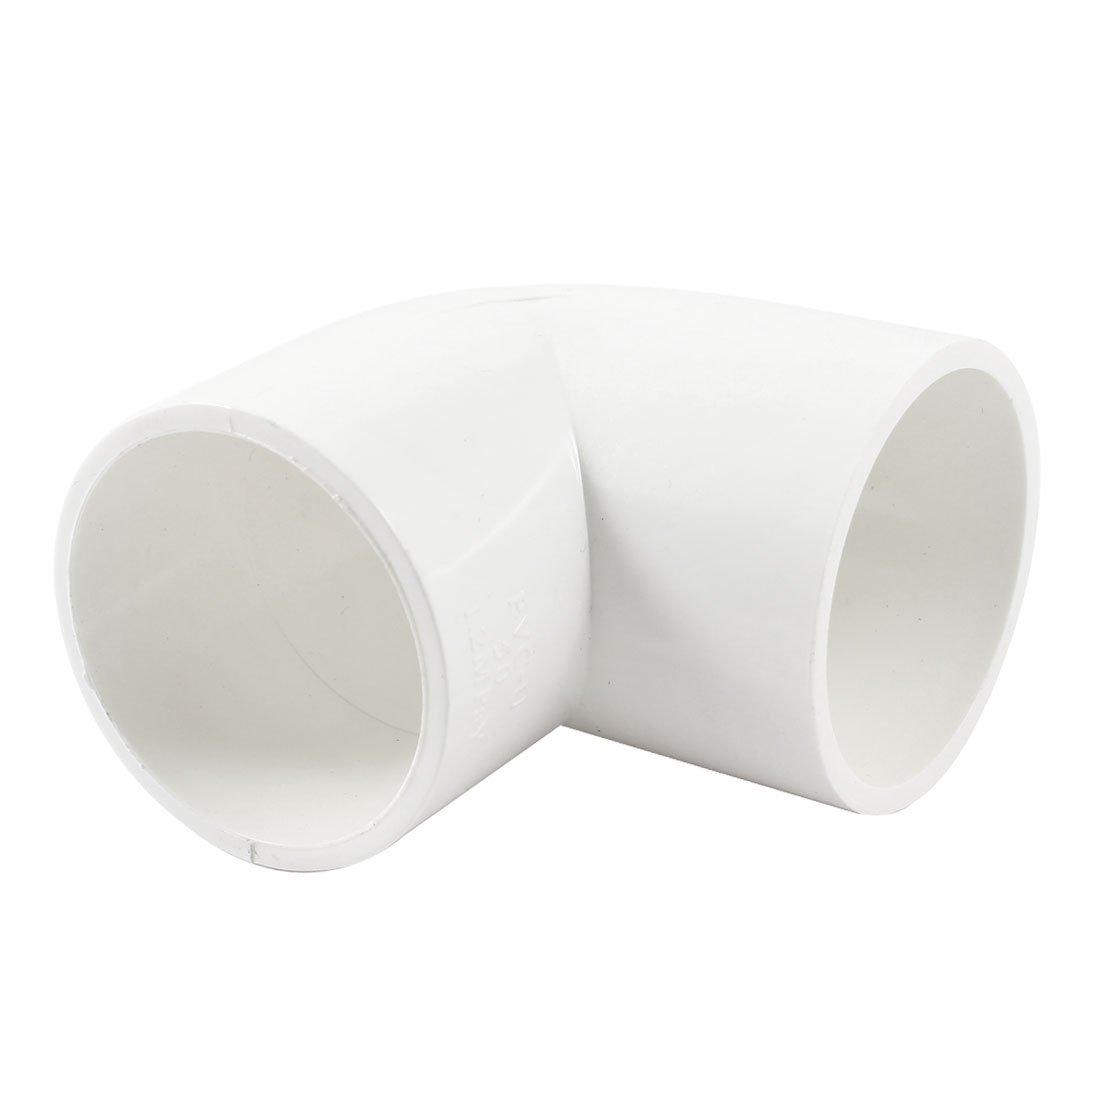 5 x 45 Degree Equal Elbow PVC Pipe Slip Coupling Fitting 20mm x 20mm